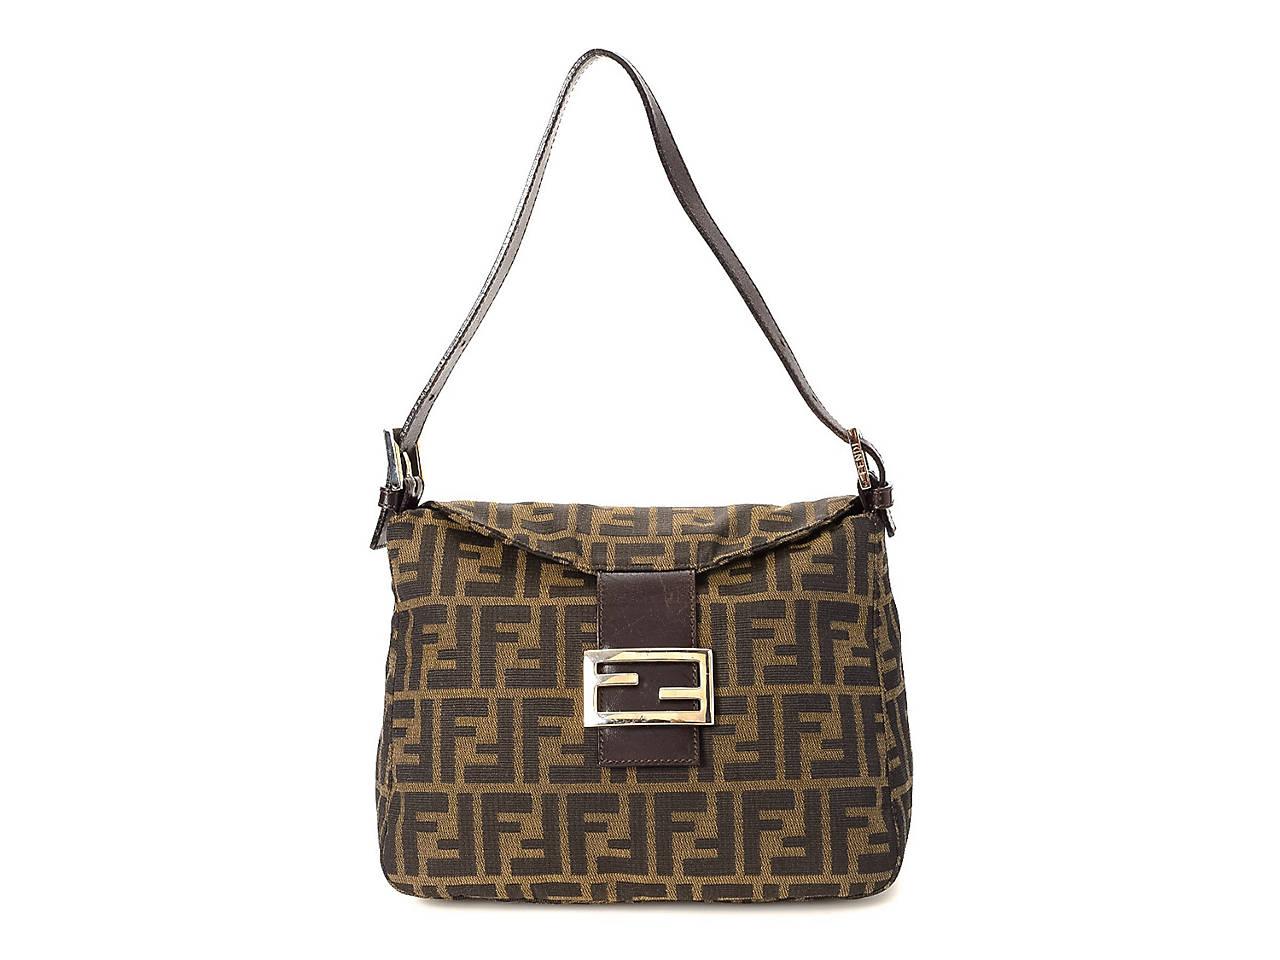 83fa562ce393 Fendi - Vintage Luxury Zucca Mamma Baguette Shoulder Bag Women s ...